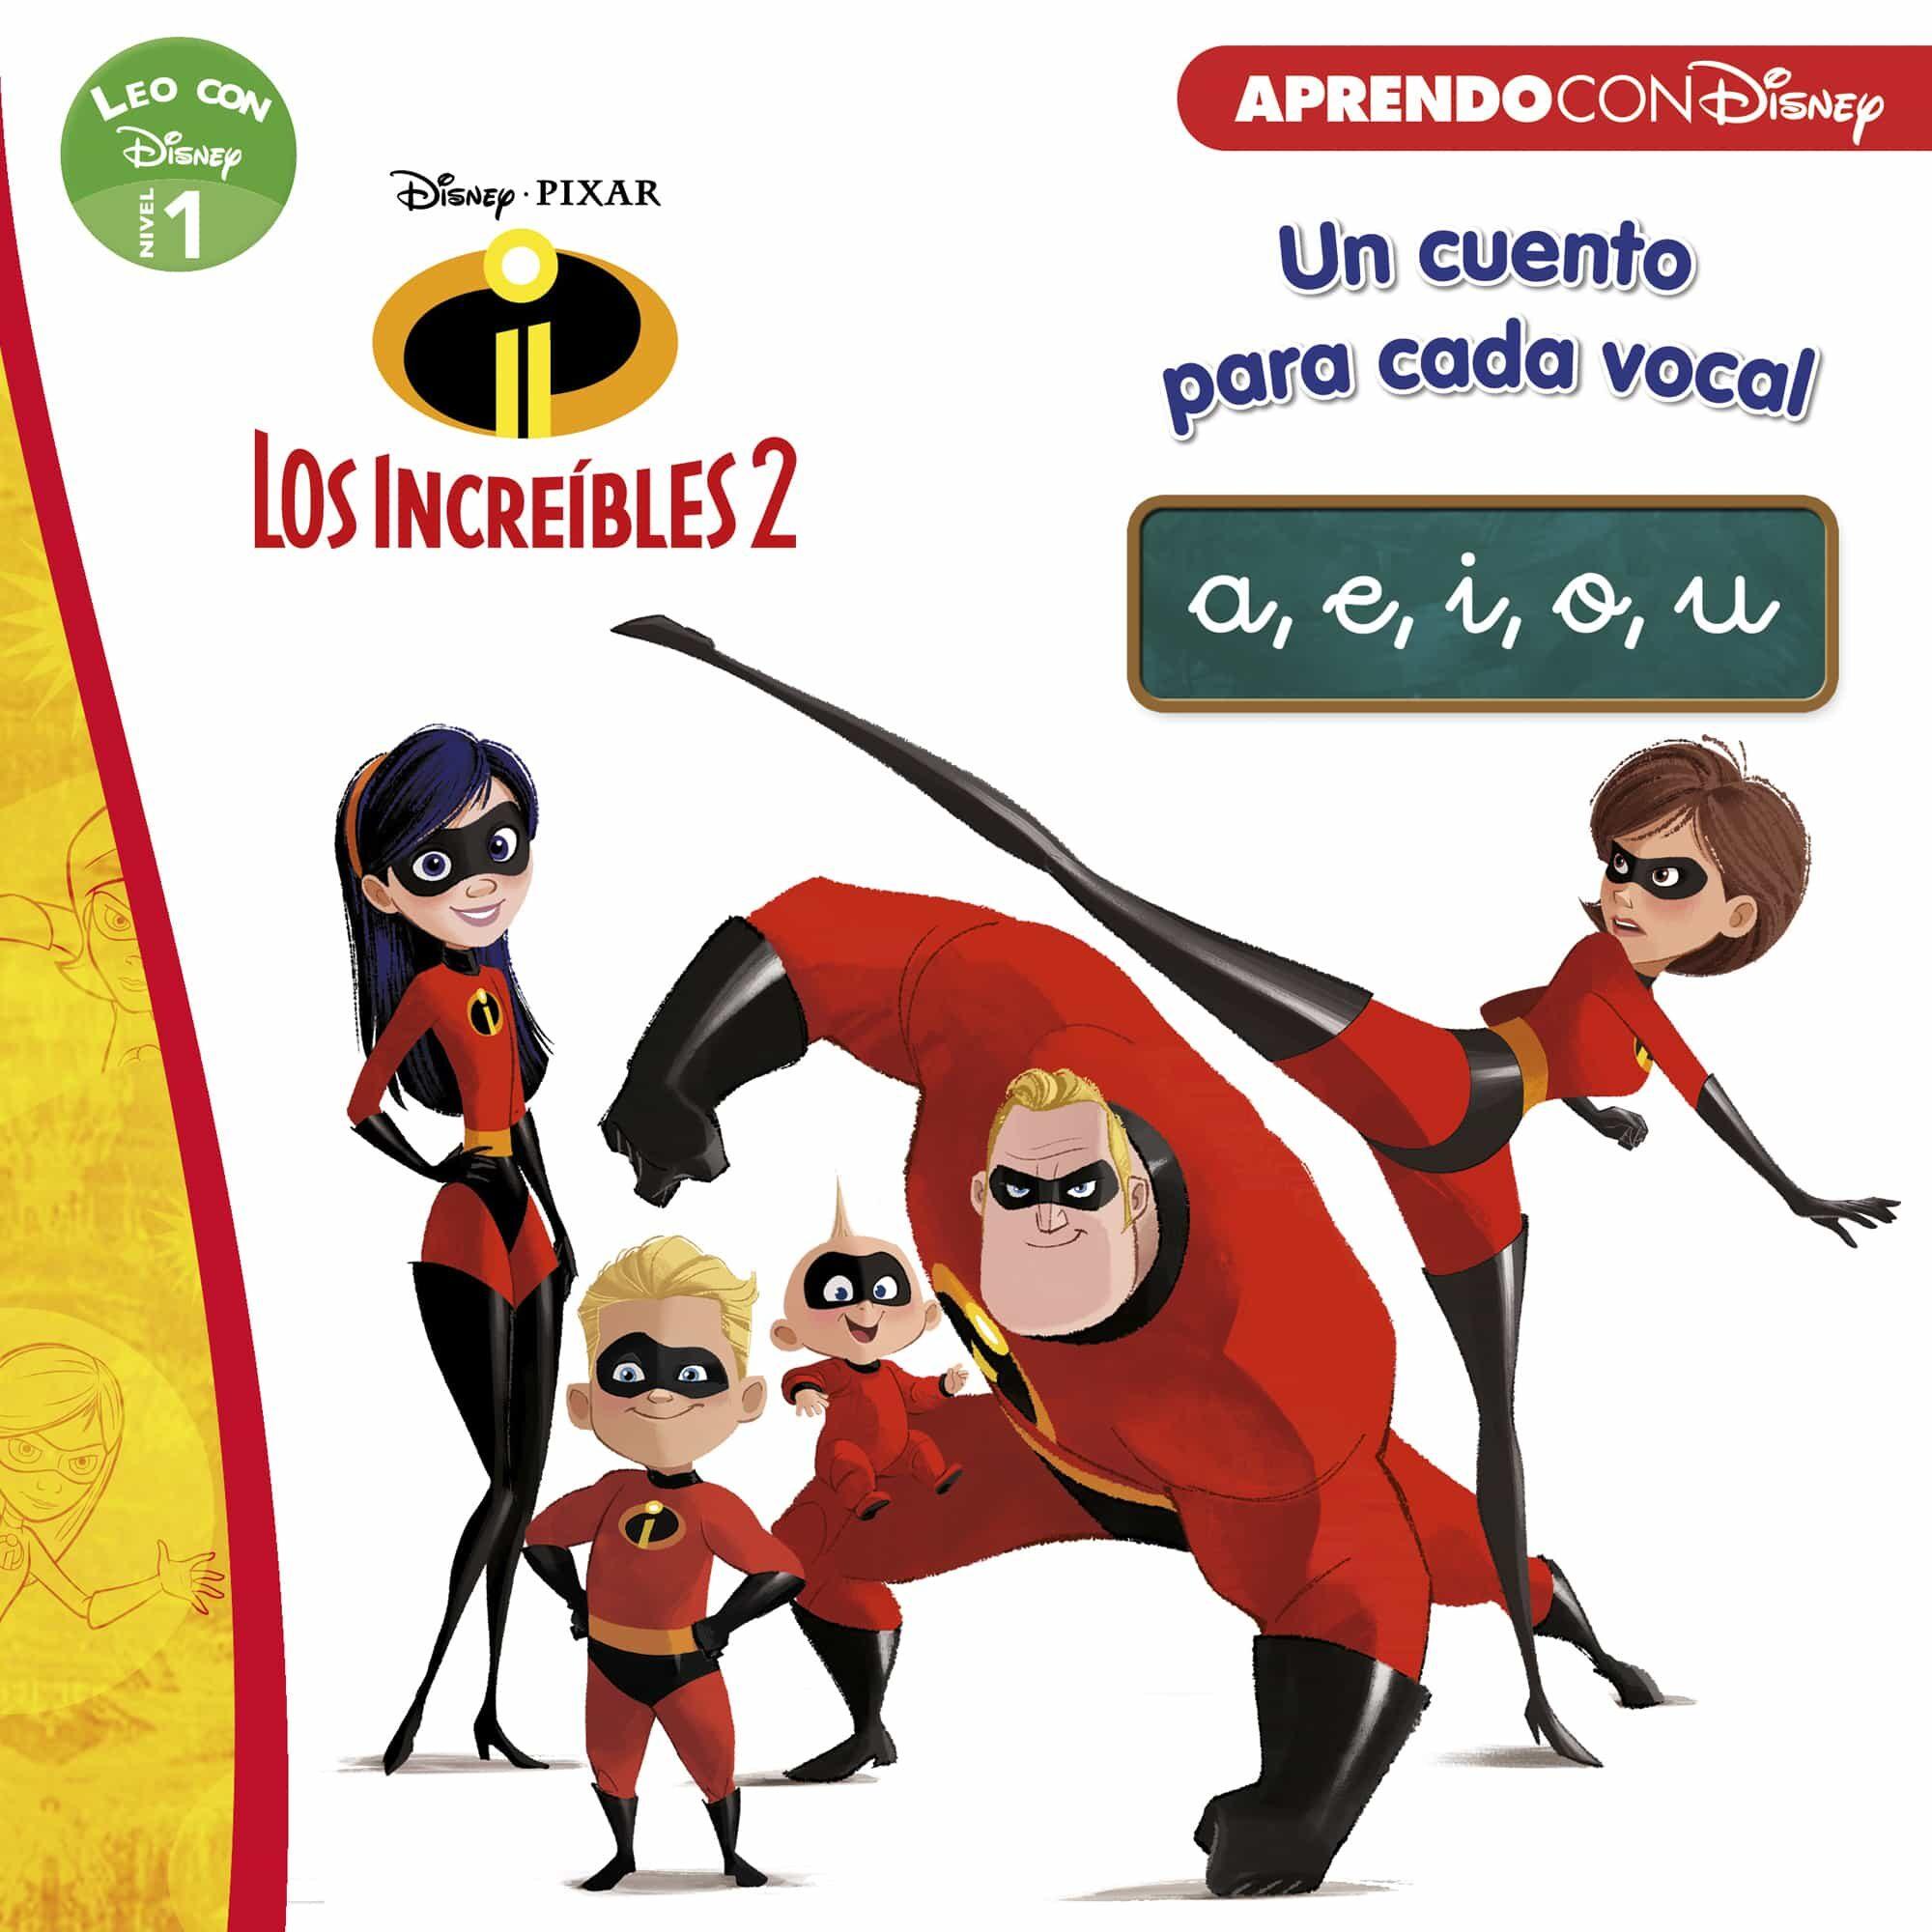 Los Increibles 2: Un Cuento Para Cada Vocal: A, E, I, O, U (leo Con Disney Nivel 1) por Vv.aa.